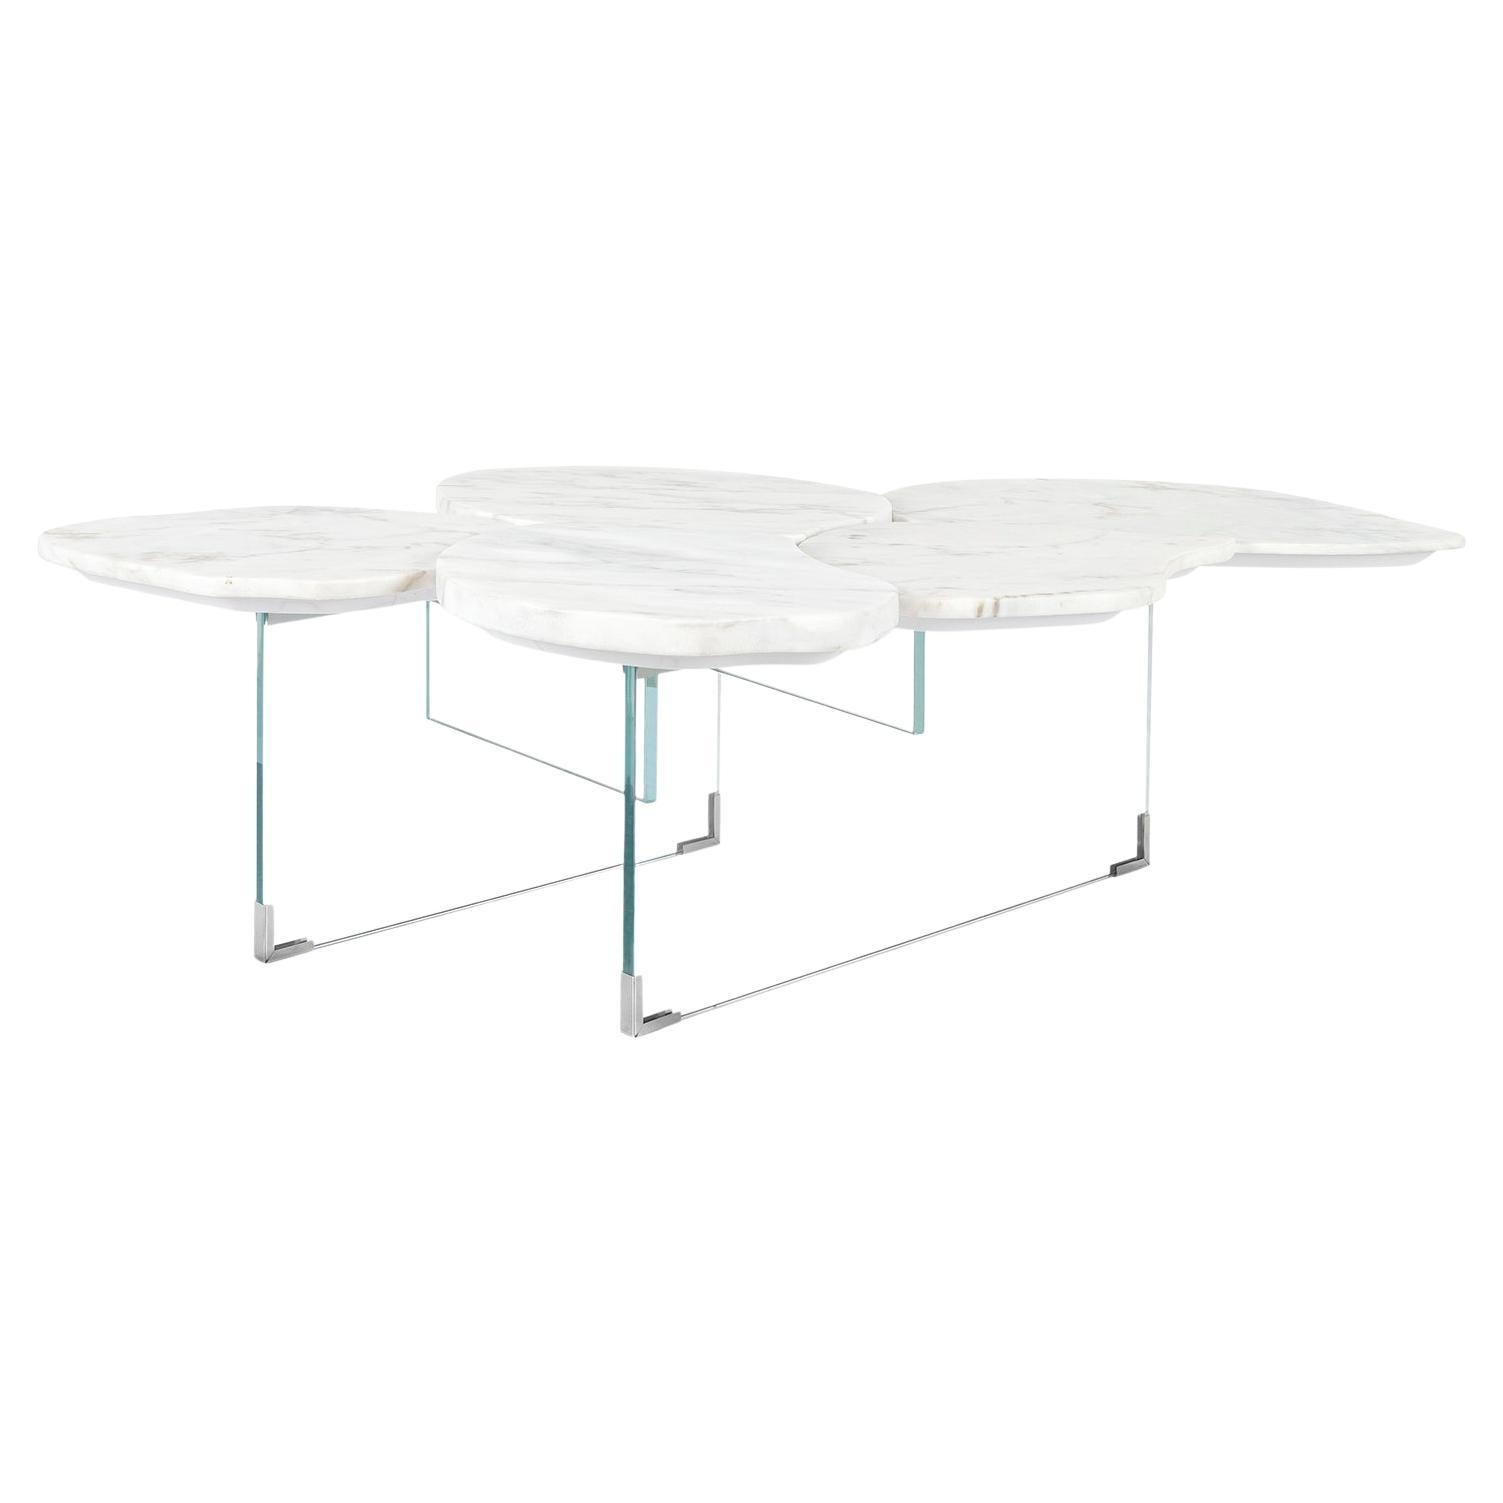 Infinity Coffee Table Medium Calacatta Bianco Marble Clear Glass Base Steel